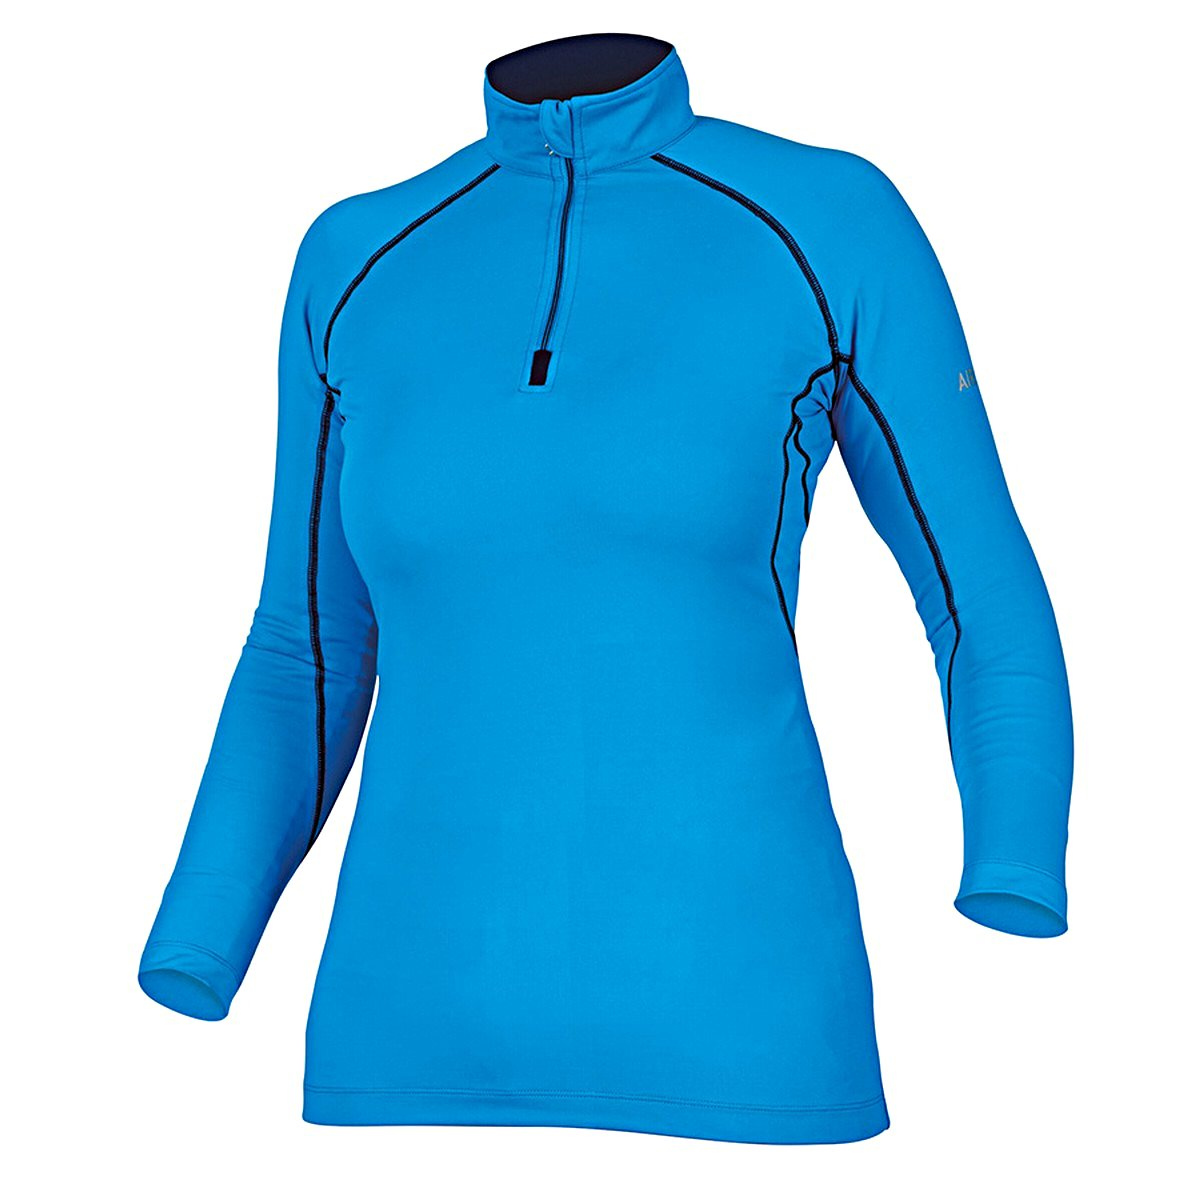 Afbeelding van Air Dri Cross Country Shirt Ladies Turquoise XS